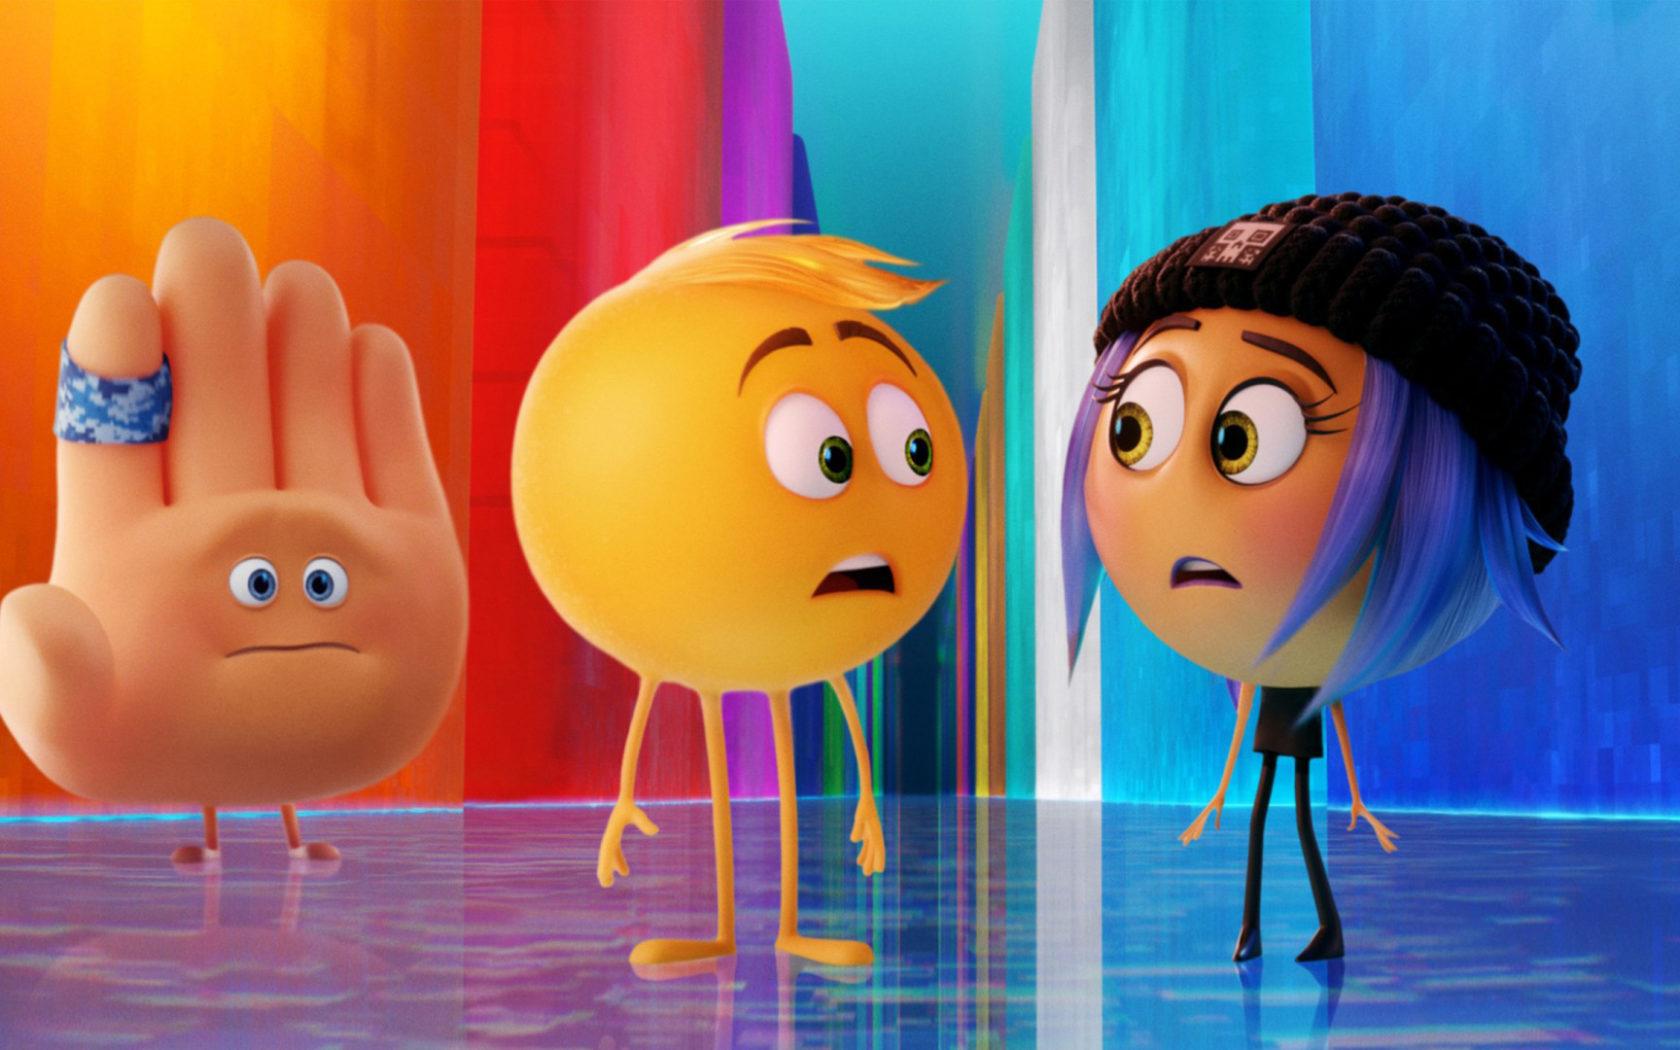 The Emoji Movie Jailbreak Gene Movie Wallpapers 1680x1050